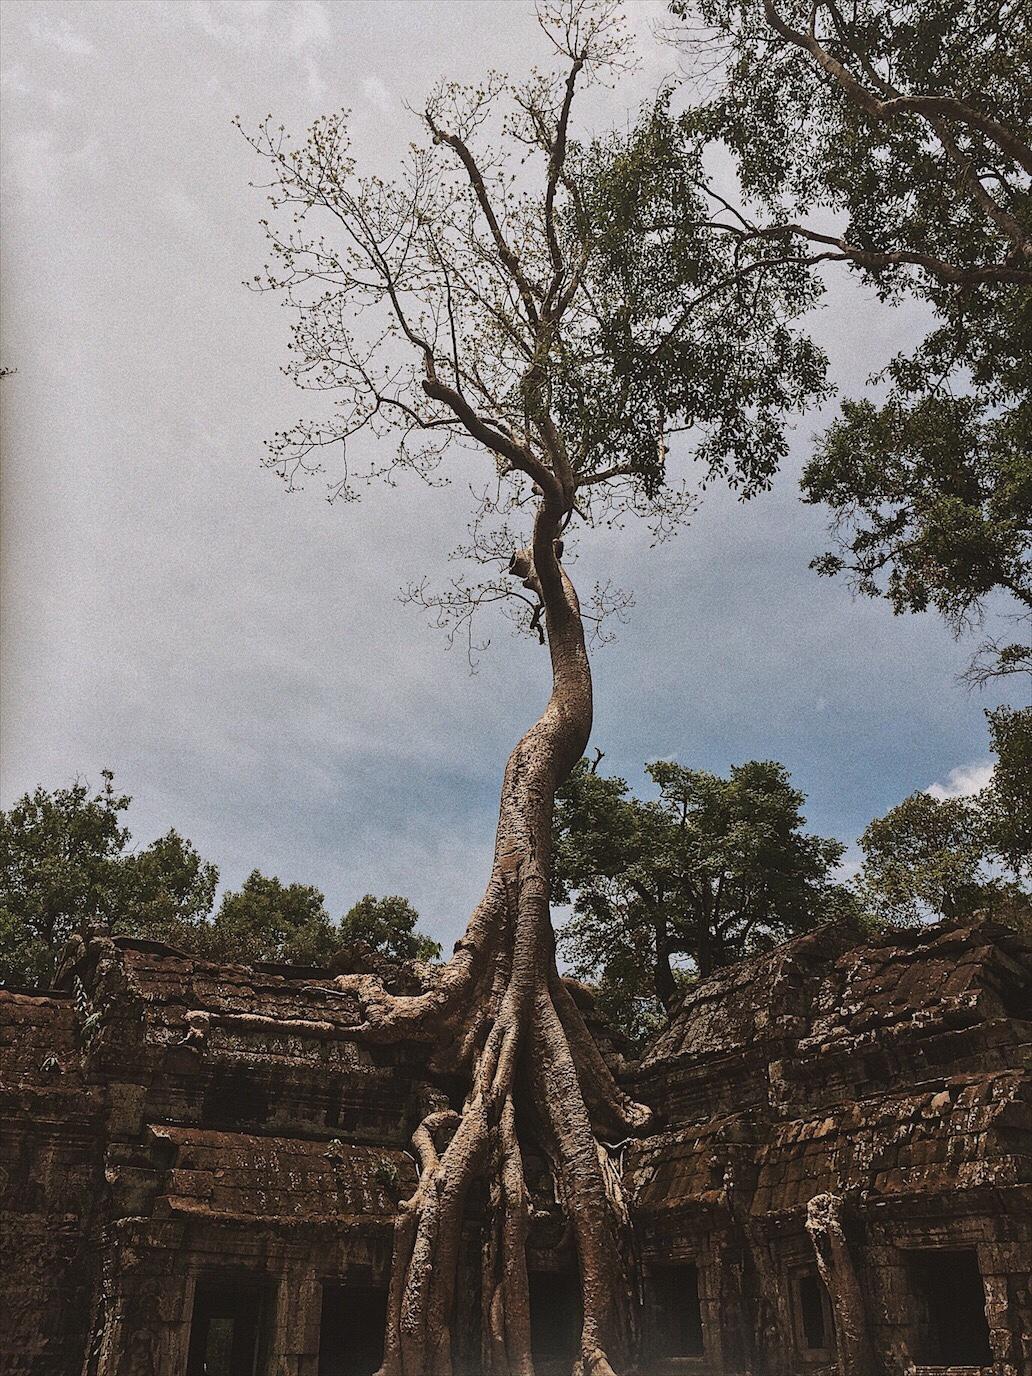 Cambodia Angkor Wat Ta Phrom Siem Reap